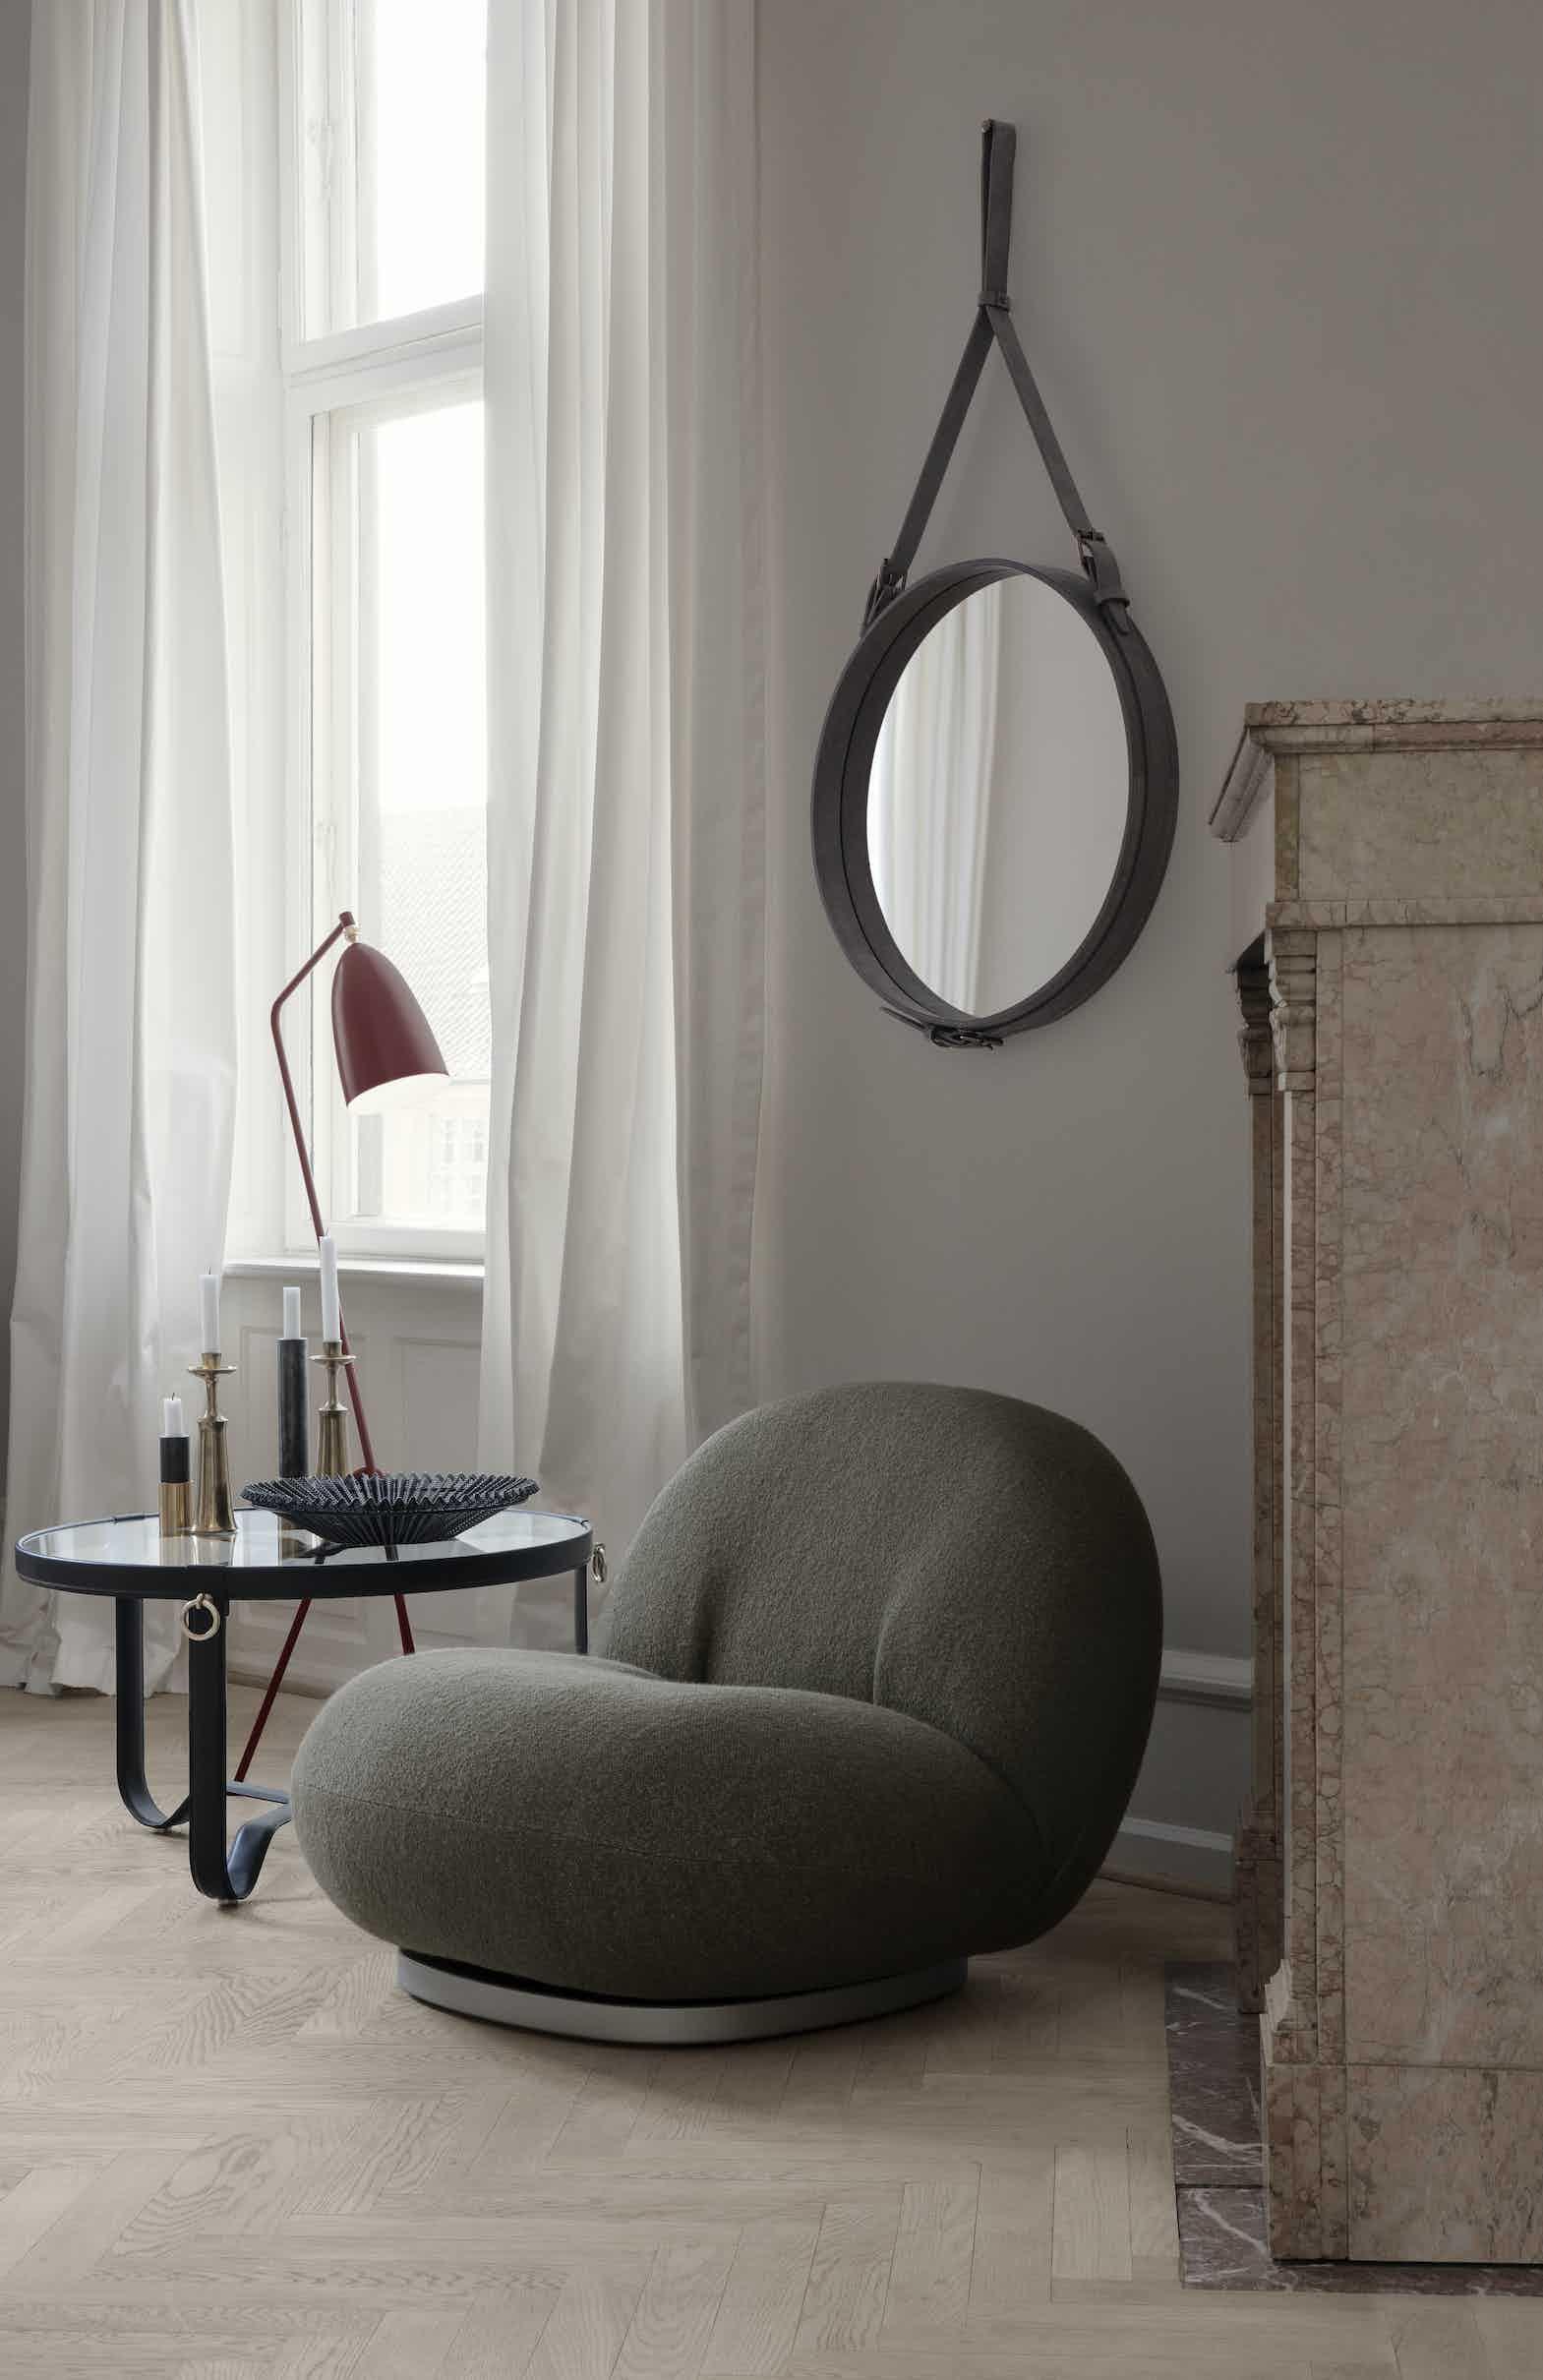 Pacha-lounge-chair-by-gubi-haute-living